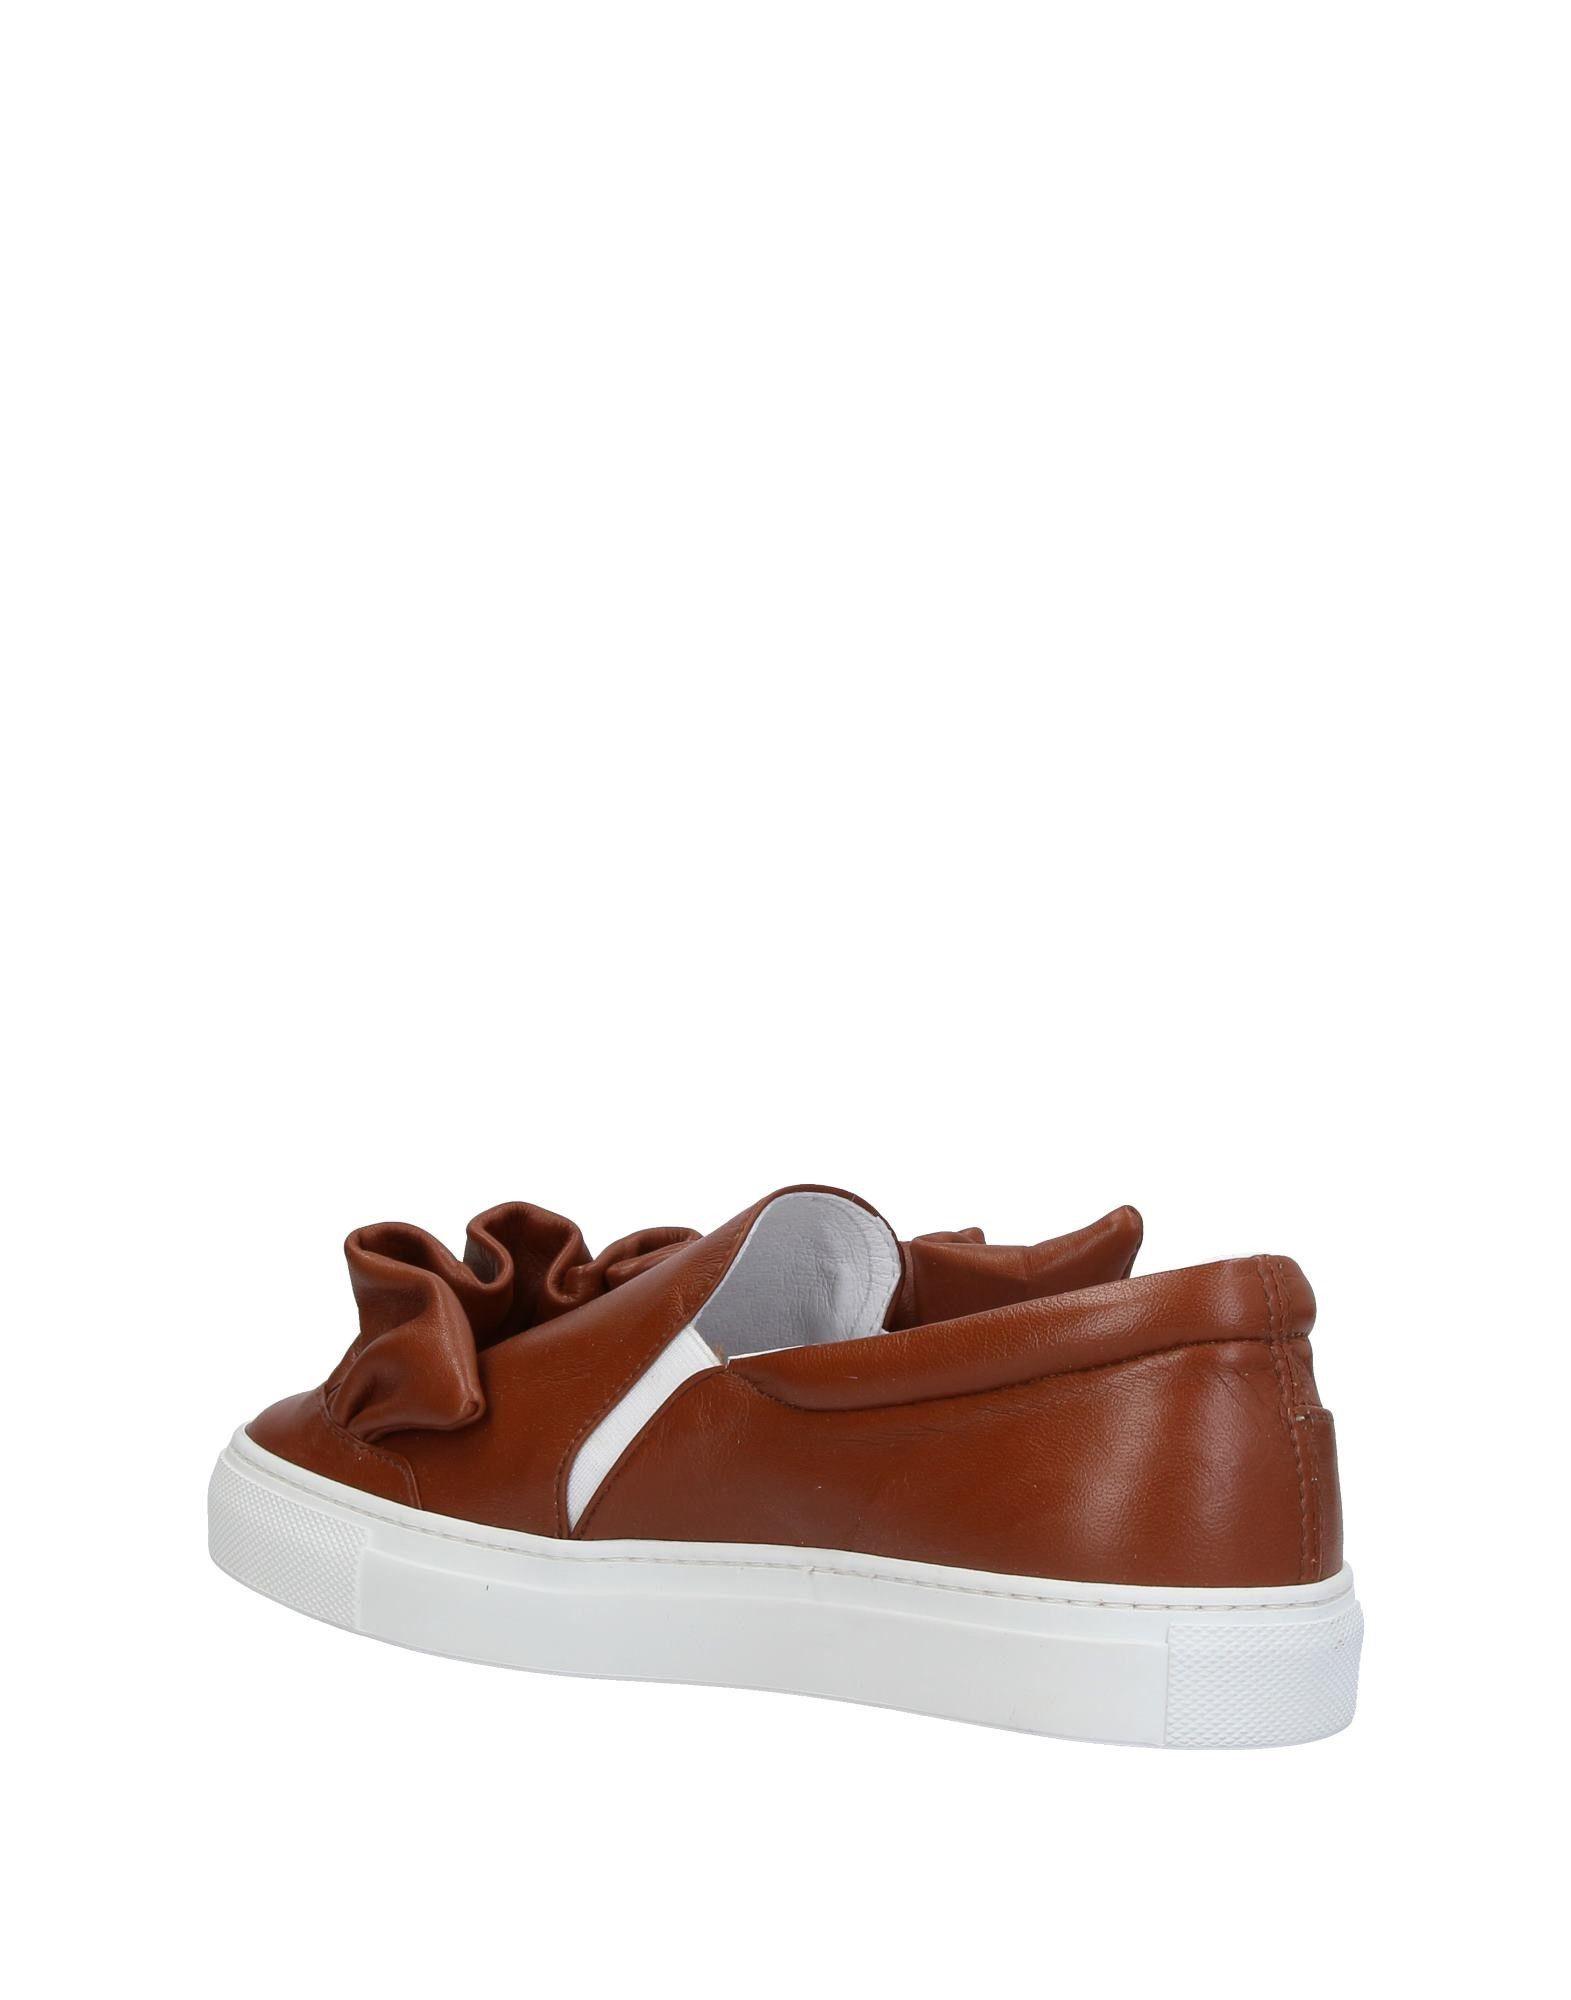 ... Sneakers Via Vela 14 Femme - Sneakers Via Vela 14 sur ...